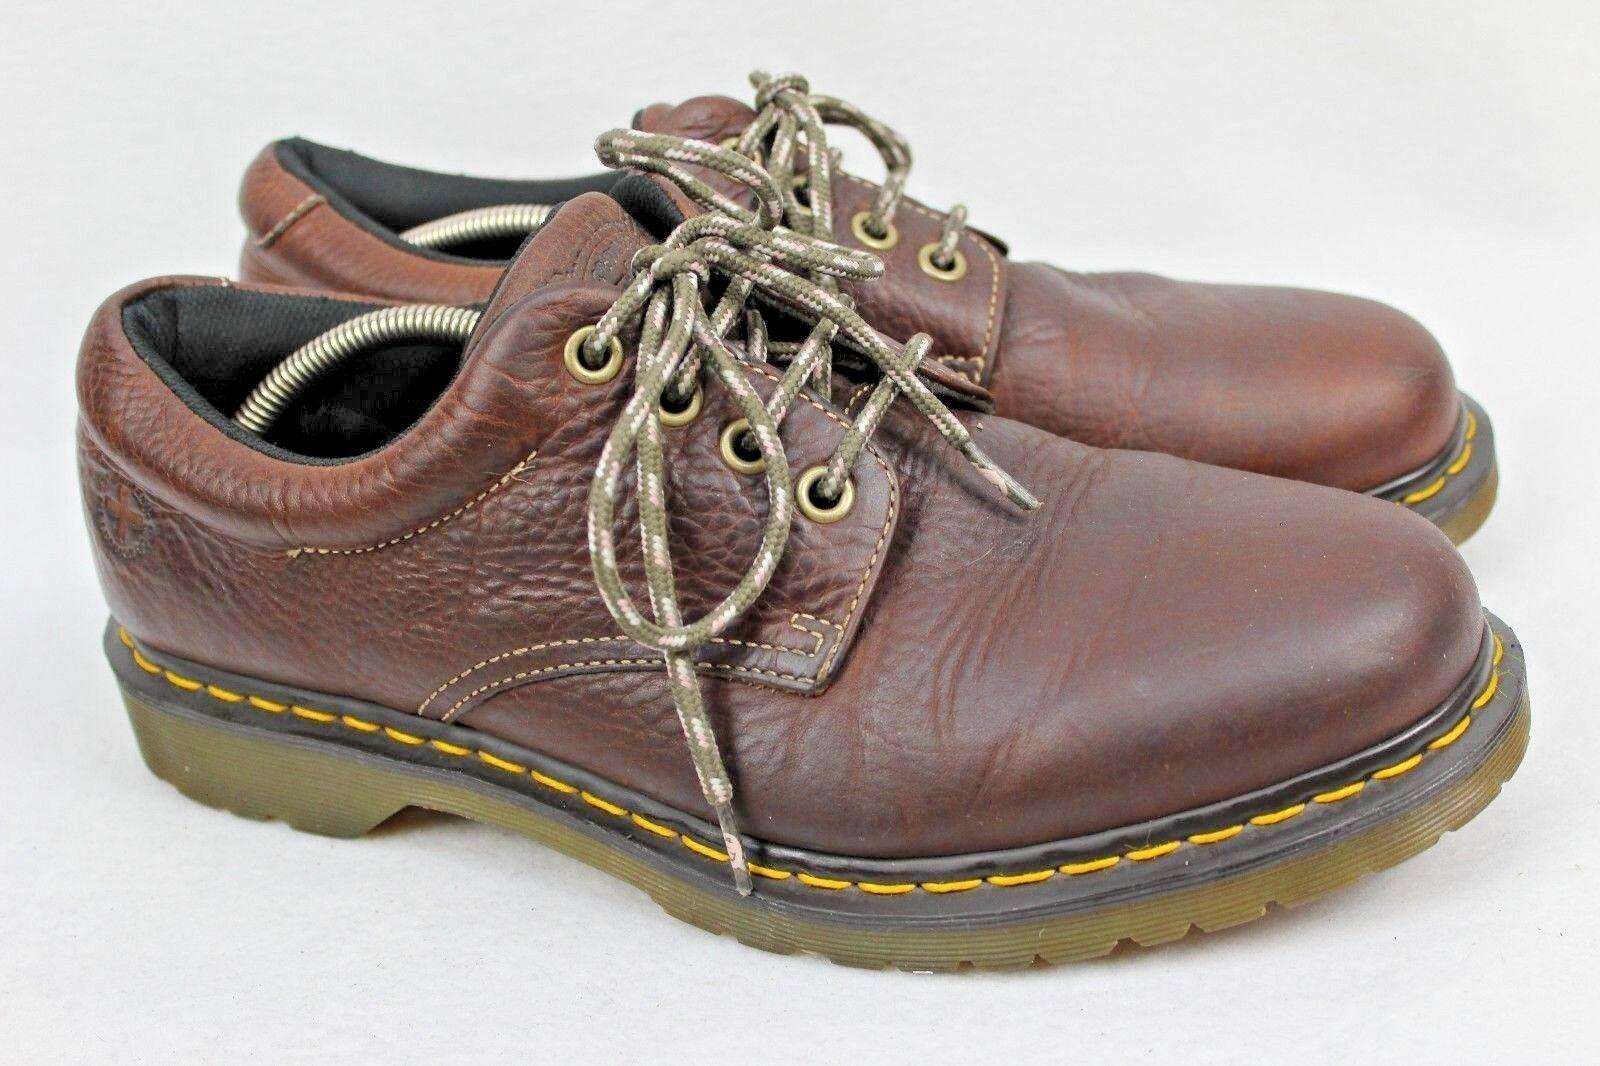 Dr. Martens Boston Men's Oxford Brown Shoes Size US 12/